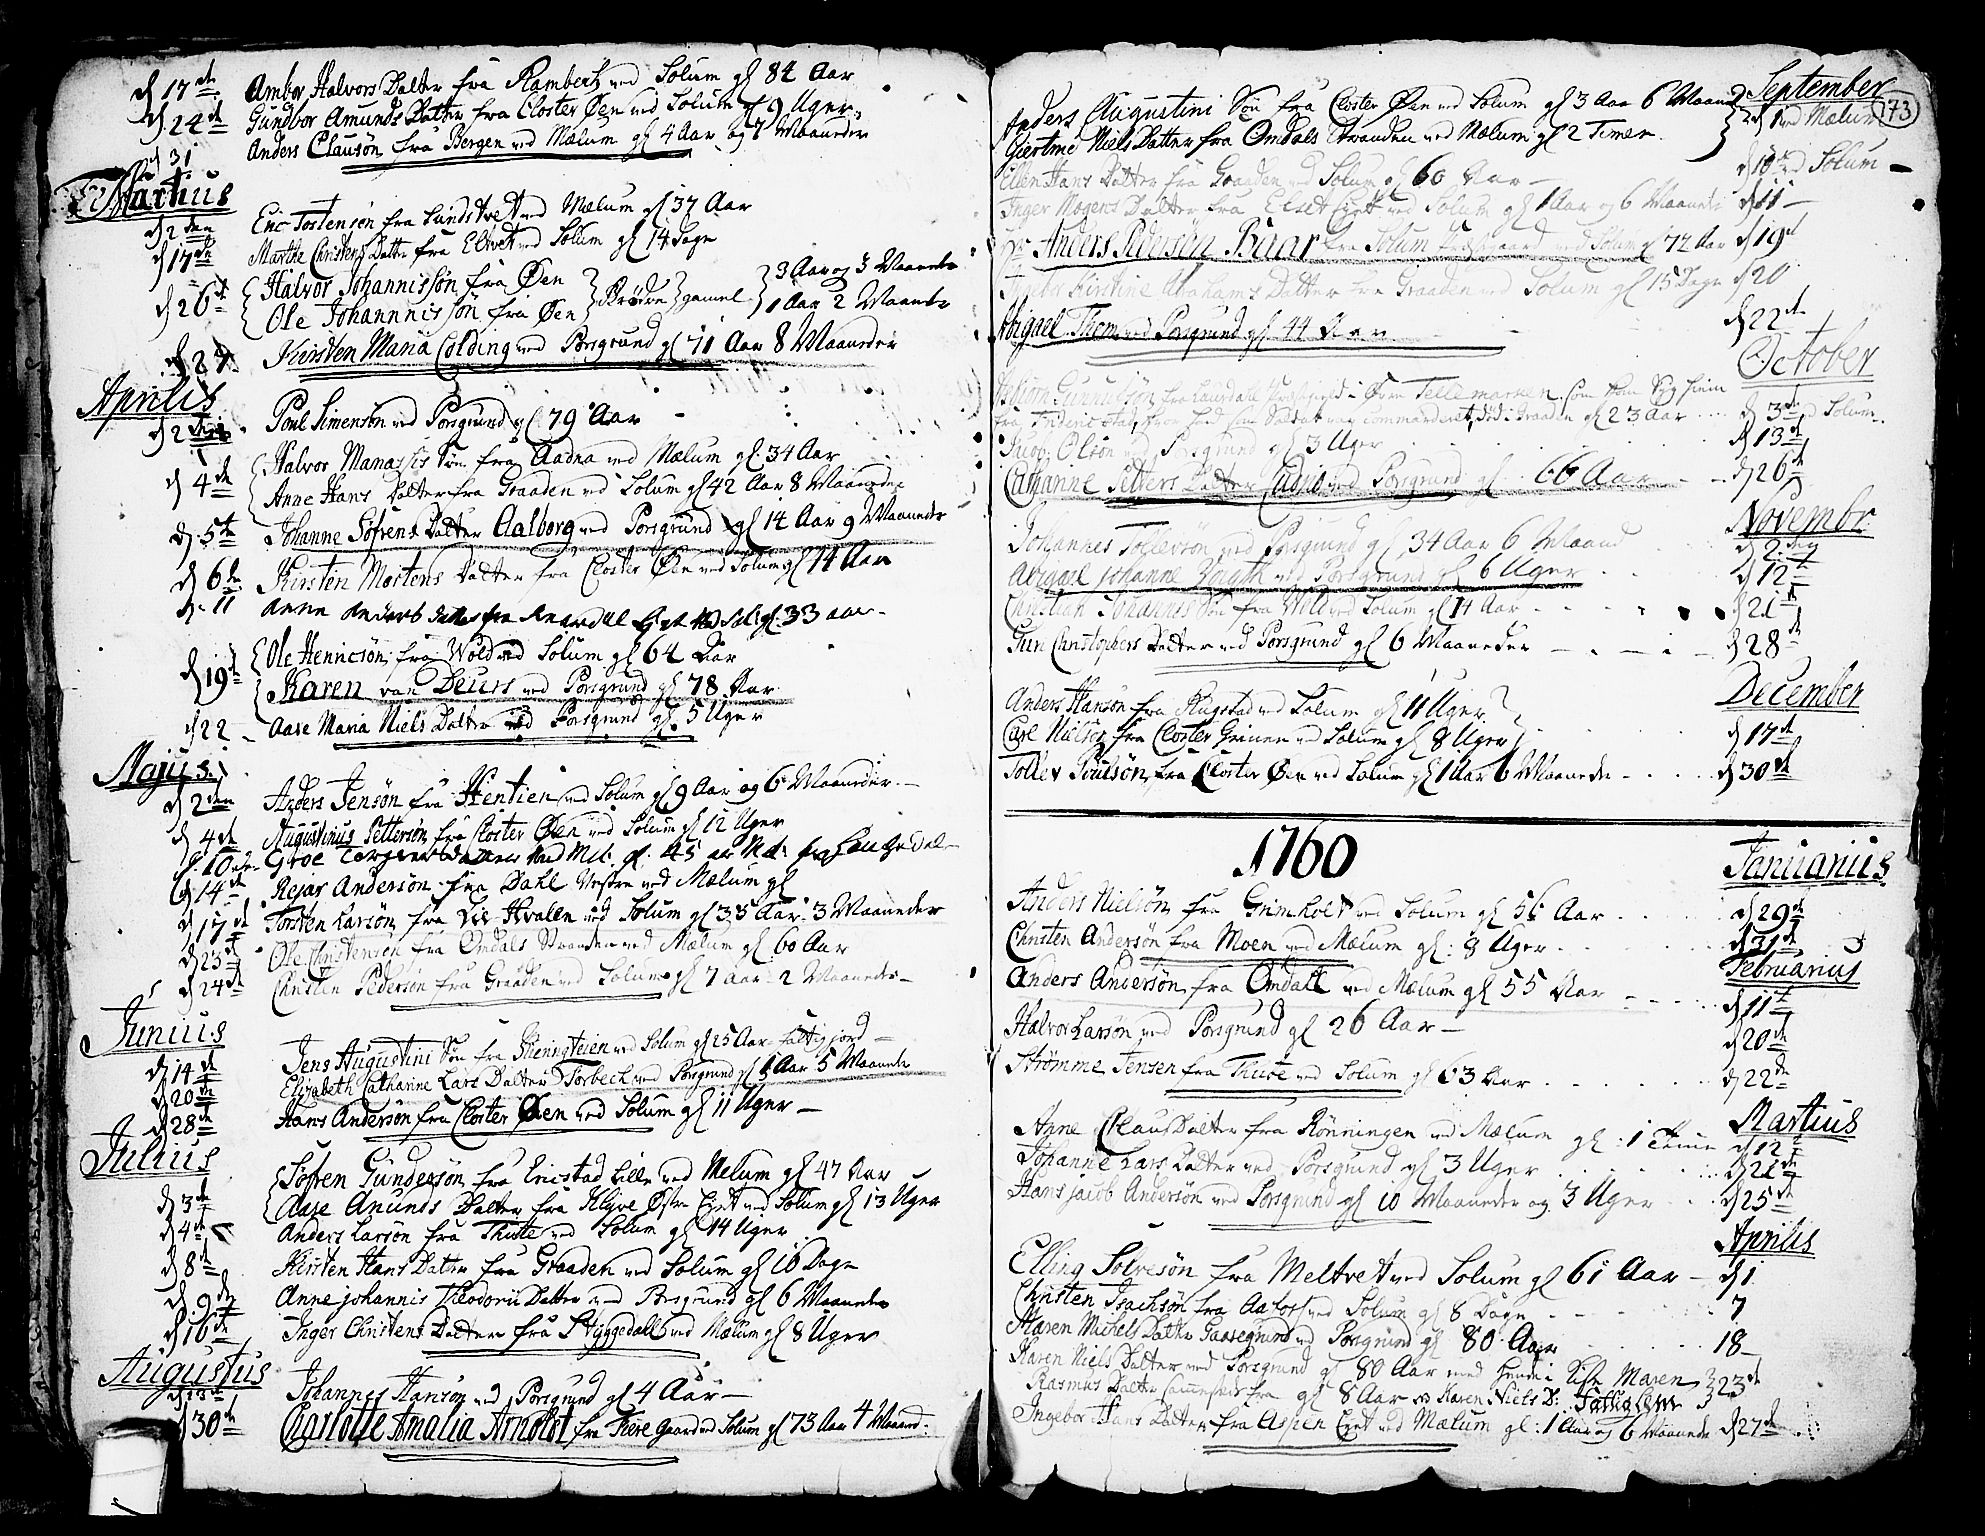 SAKO, Solum kirkebøker, F/Fa/L0002: Ministerialbok nr. I 2, 1713-1761, s. 173